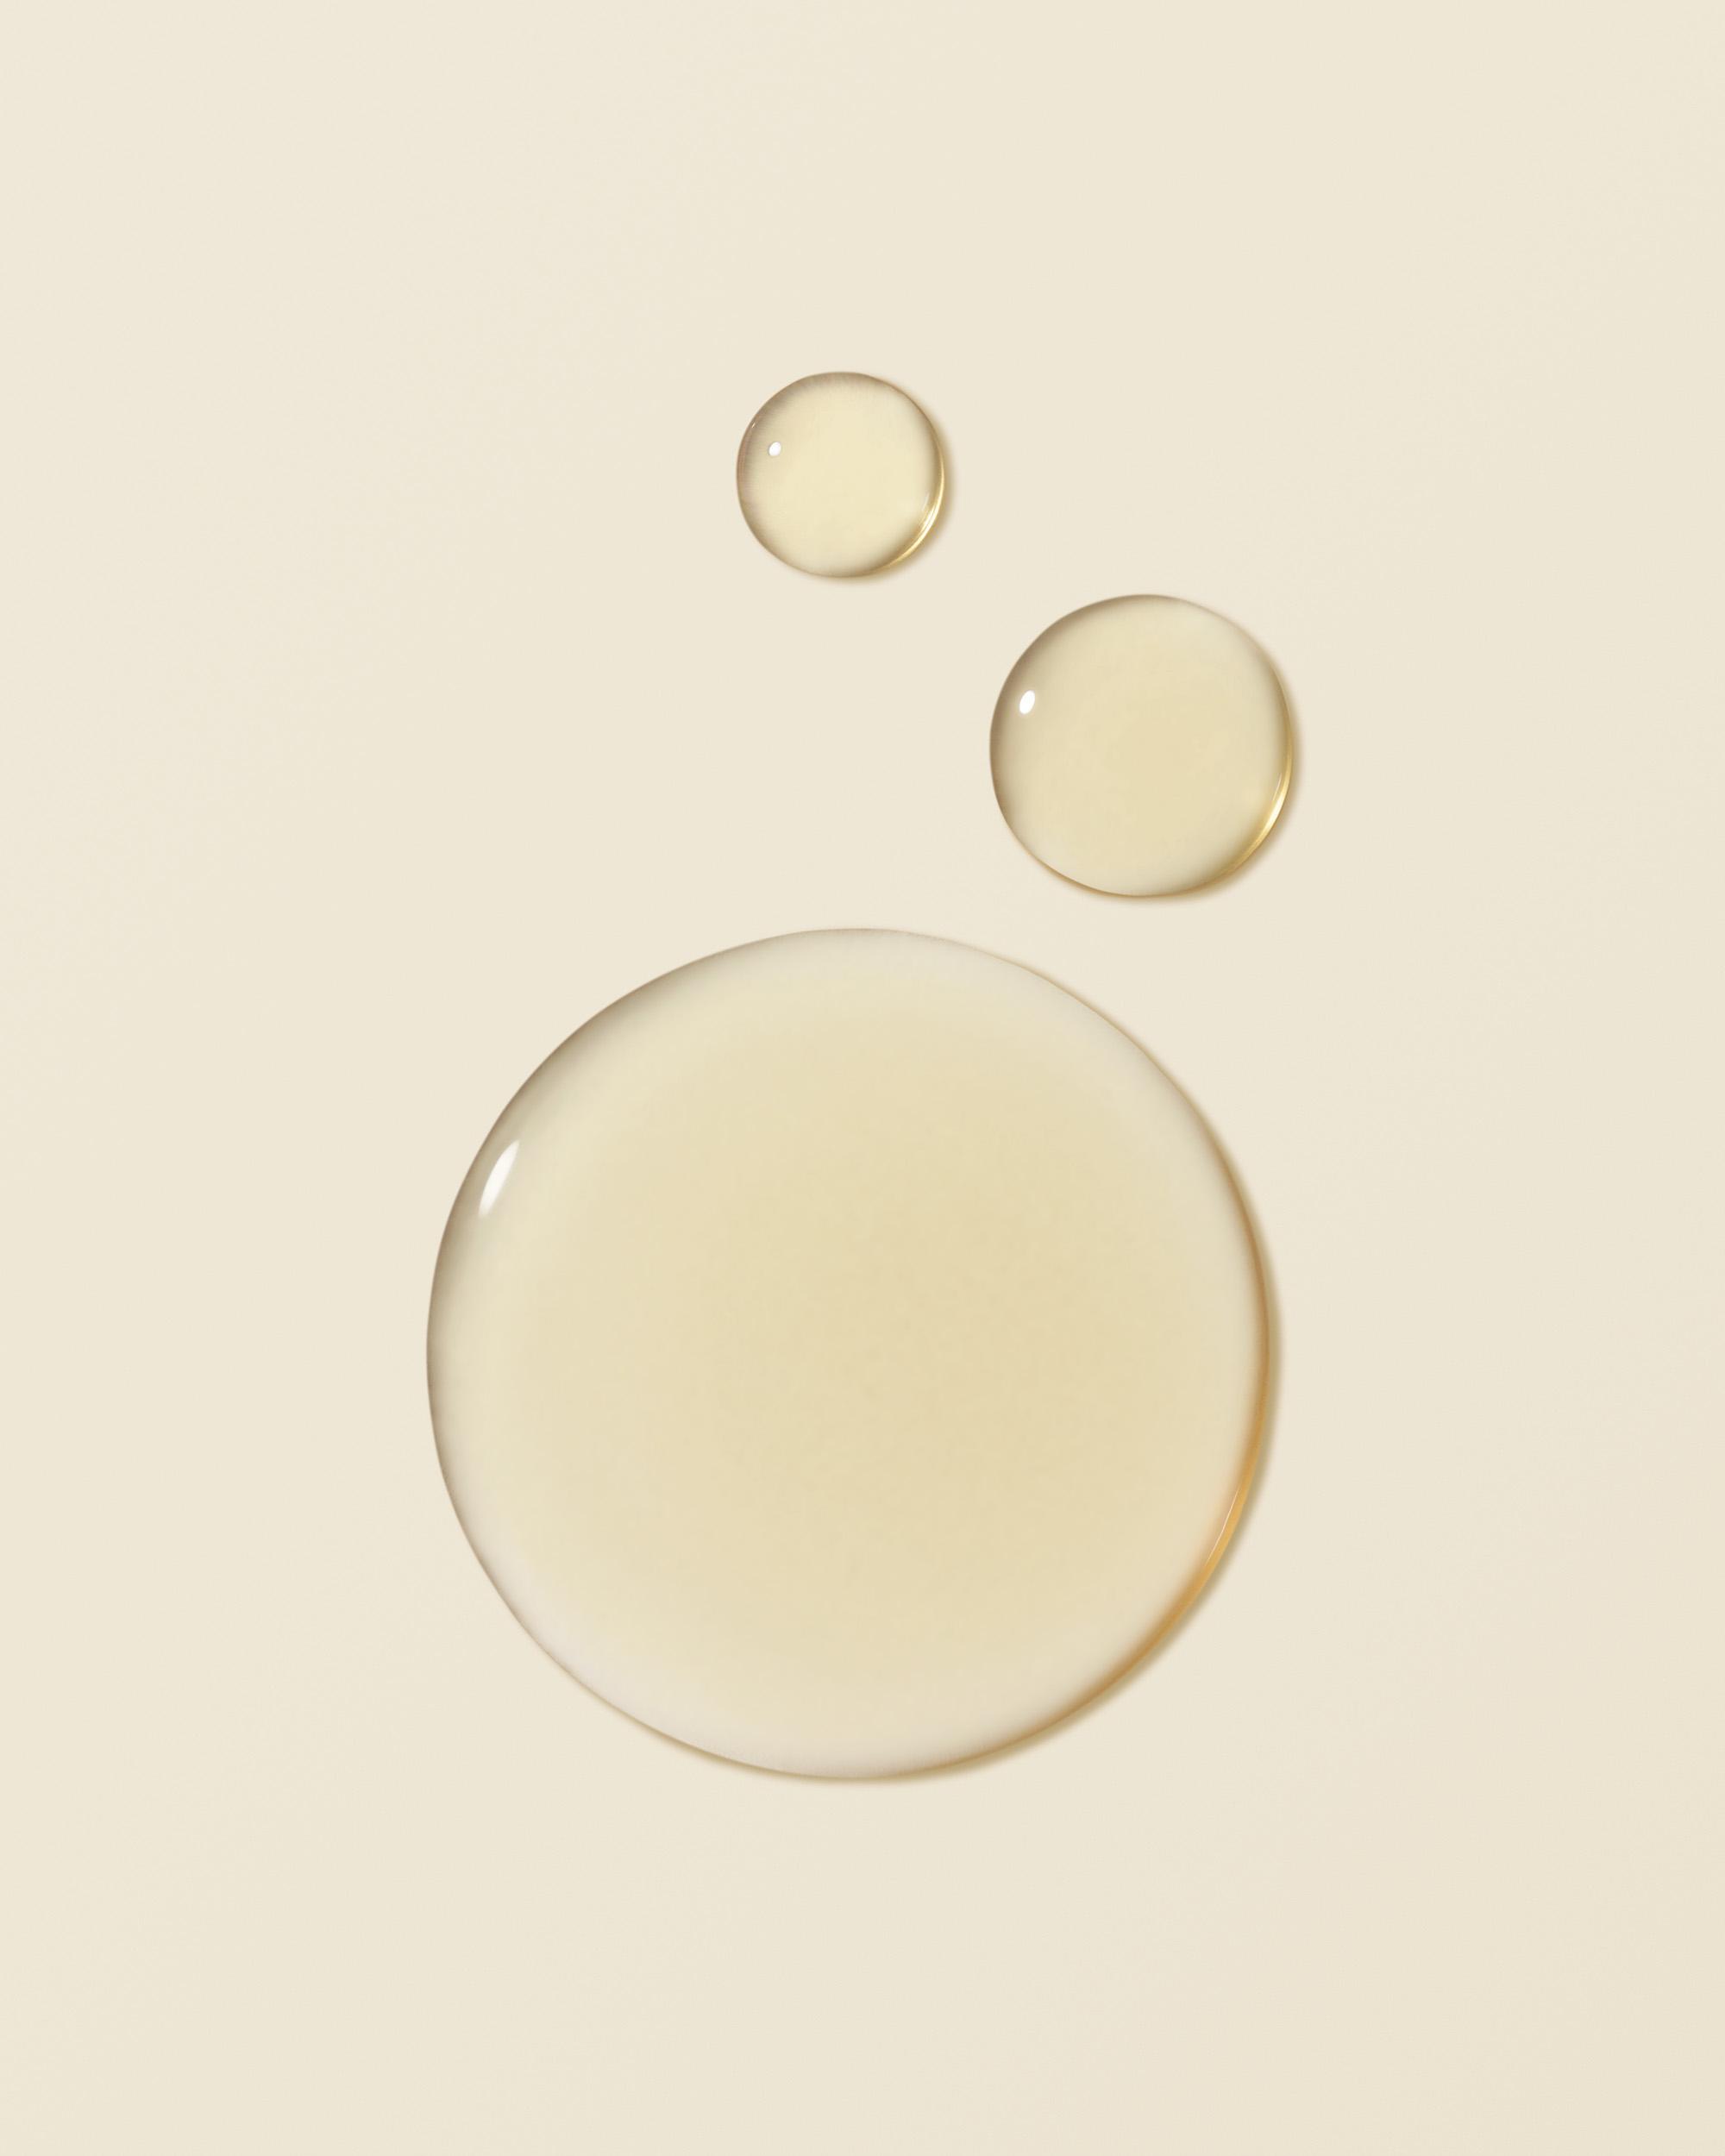 Essence-smudge-4x5.jpg